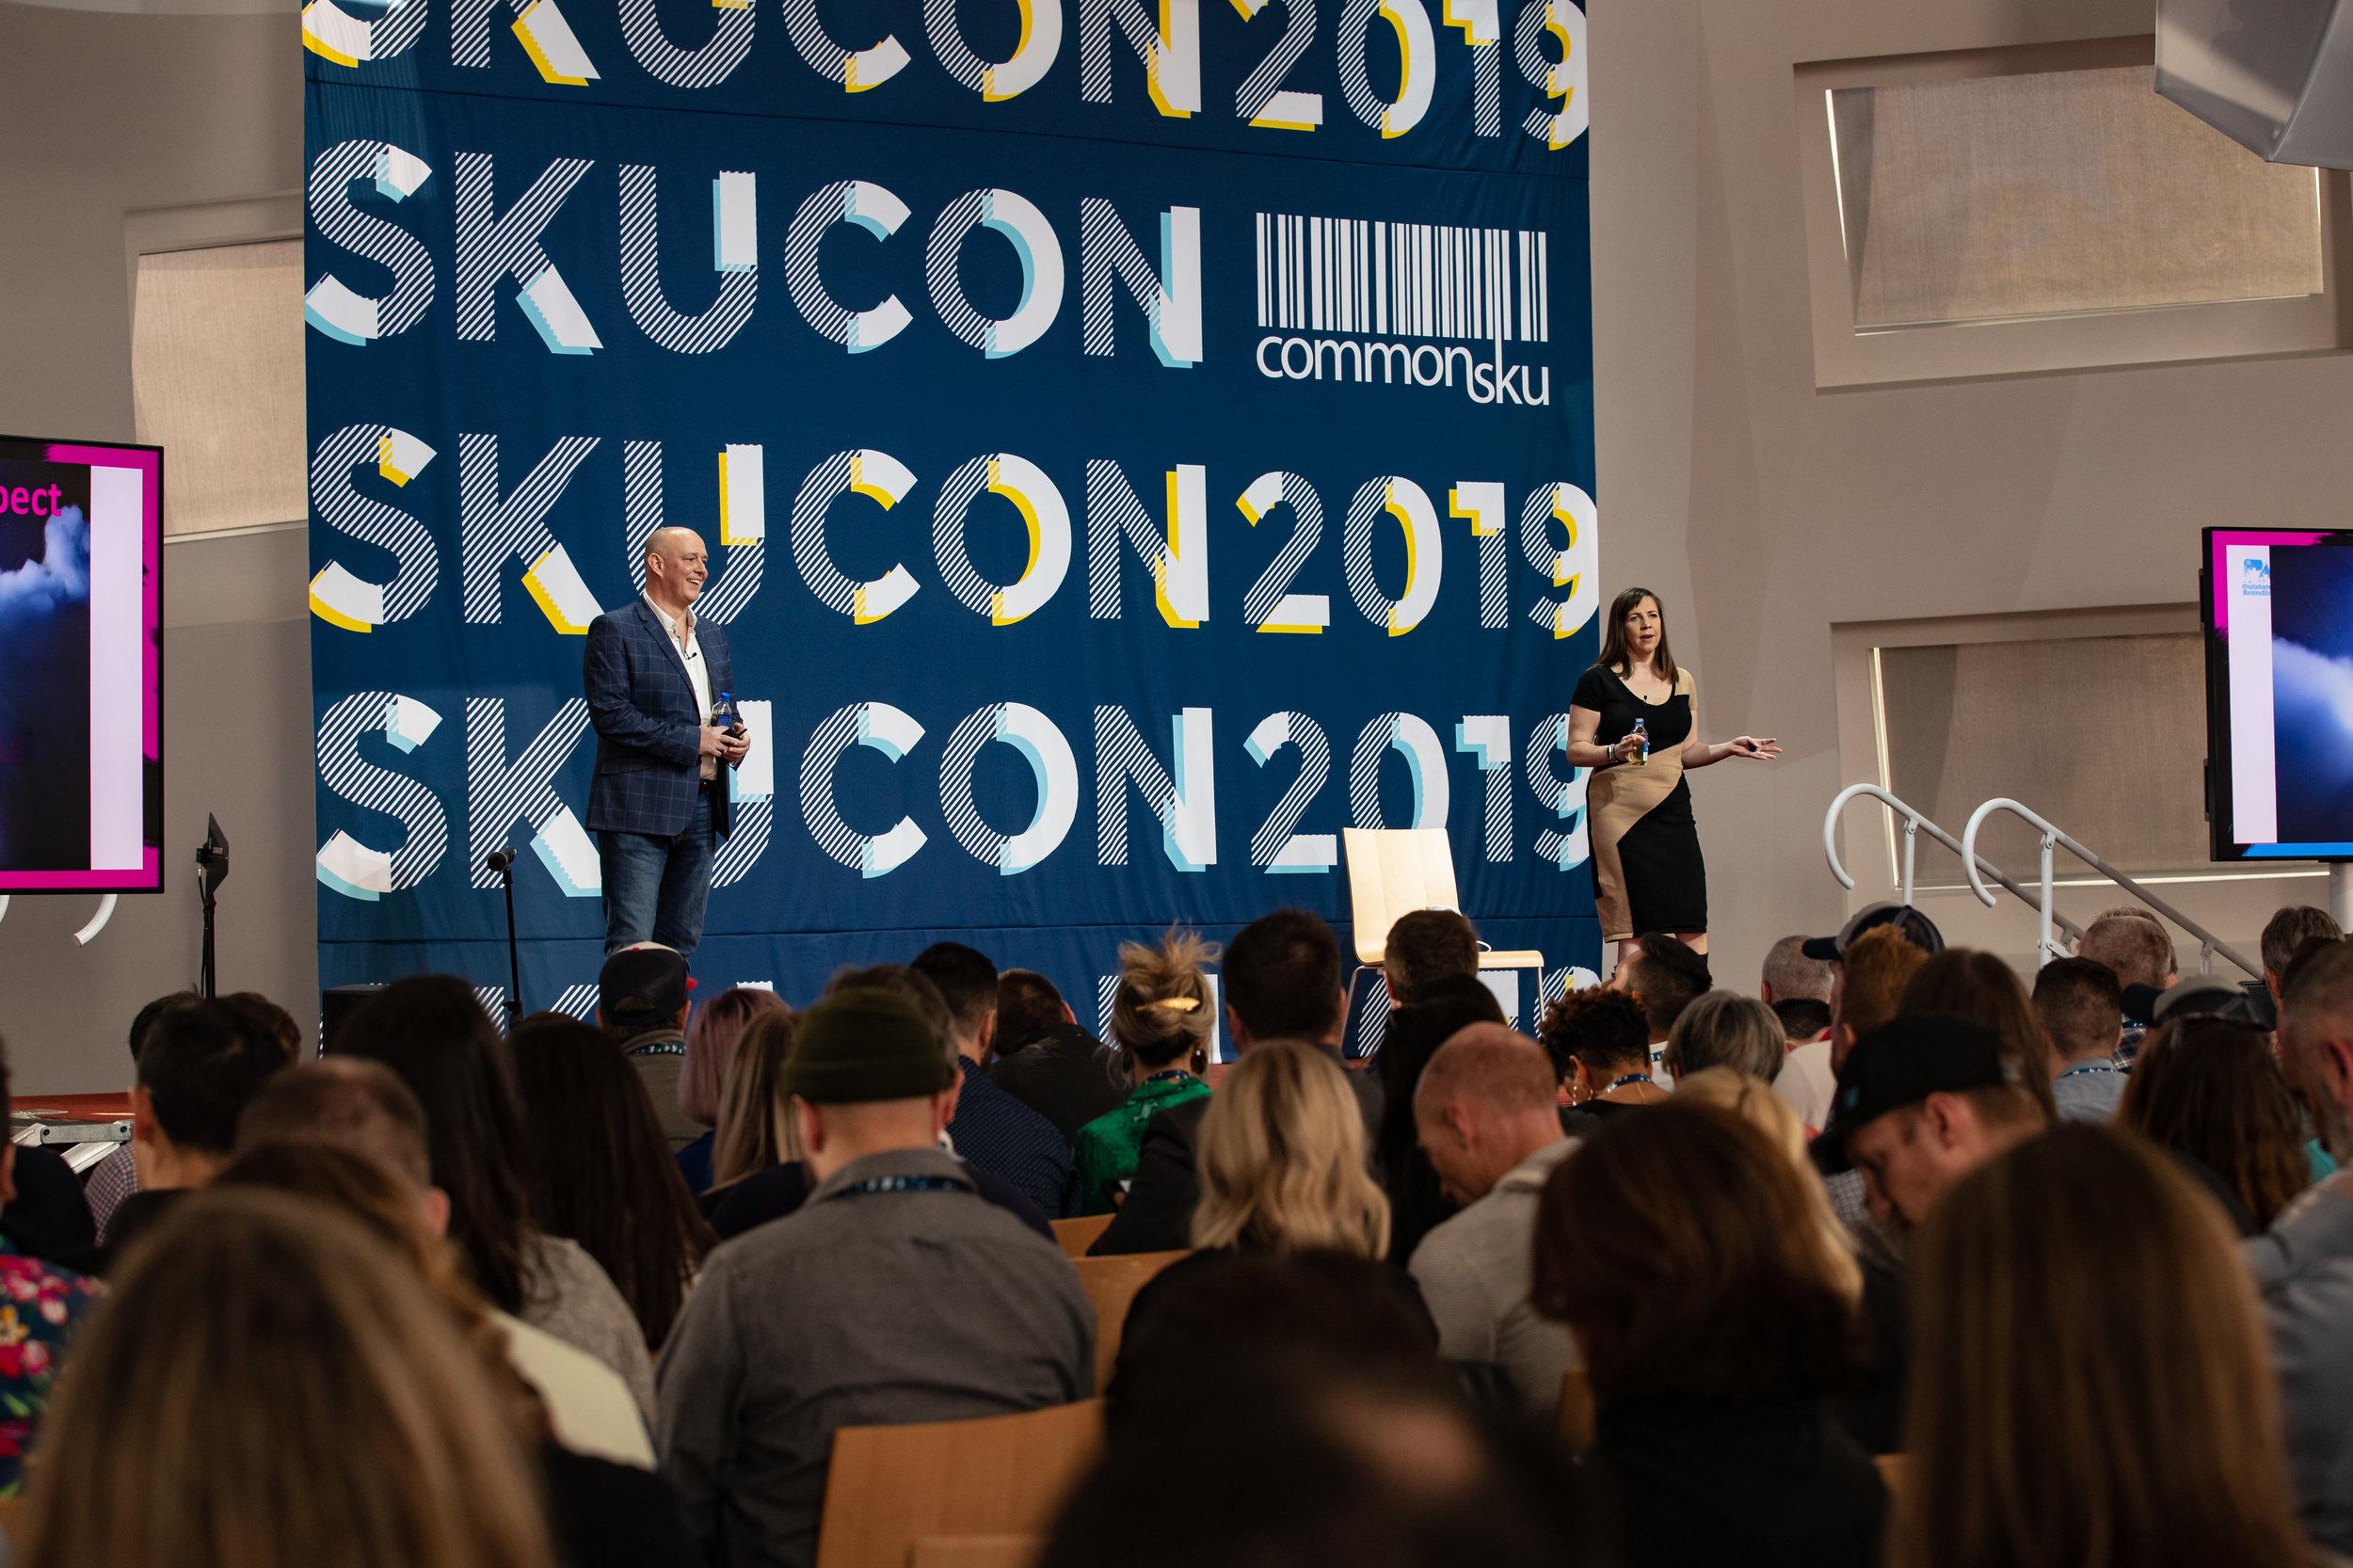 skucon-andy-sarah-outstanding-branding.jpg